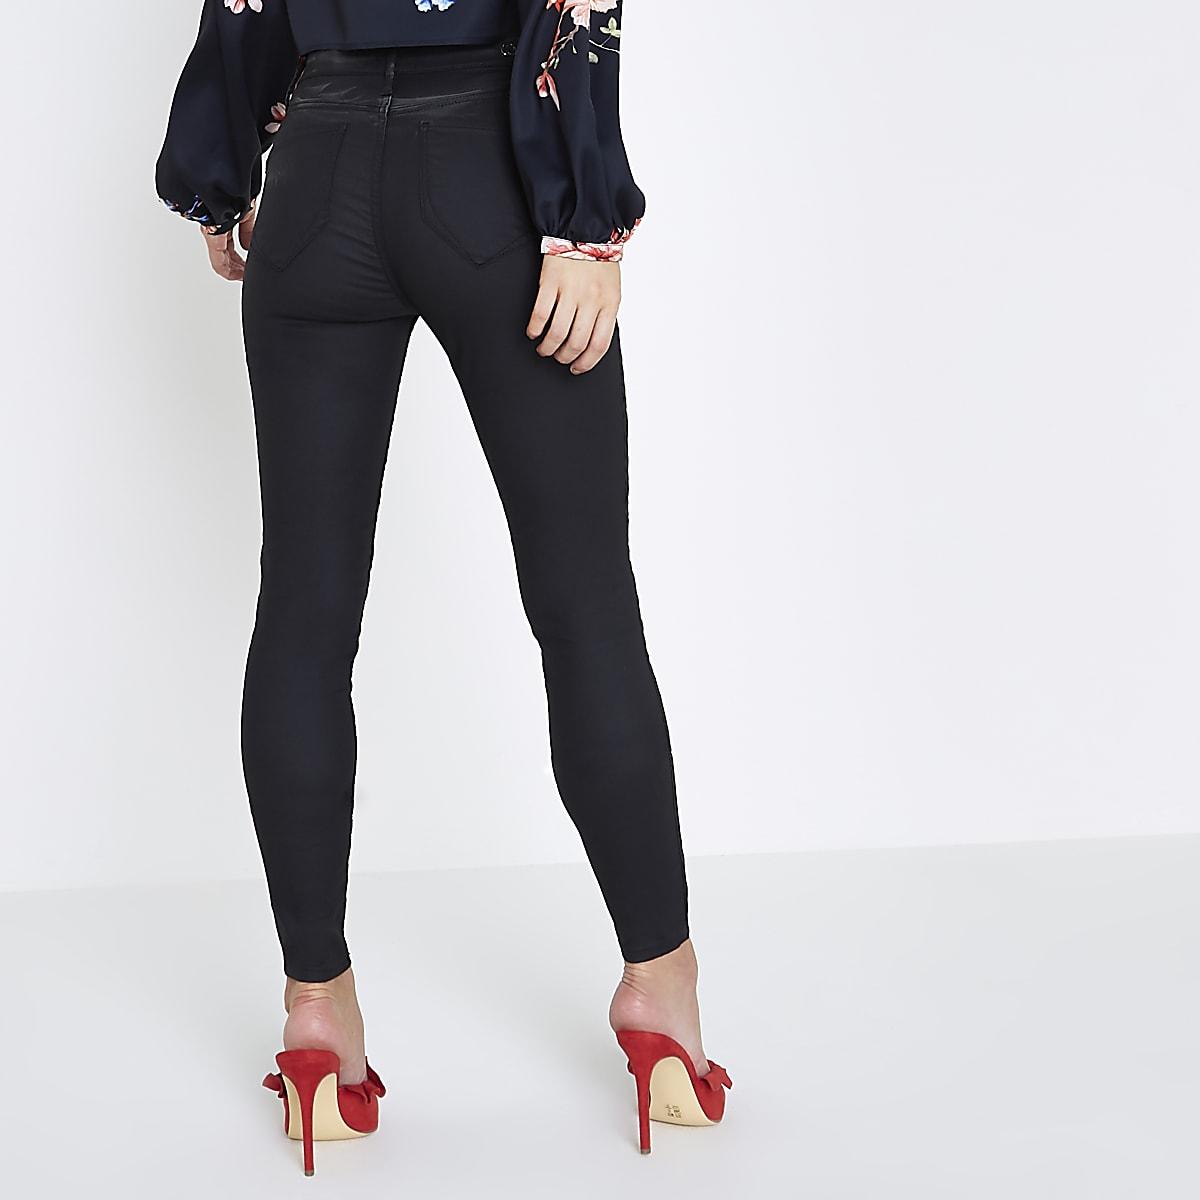 44b67829b3948 Petite black coated Molly skinny jeggings - Jeggings - Jeans - women